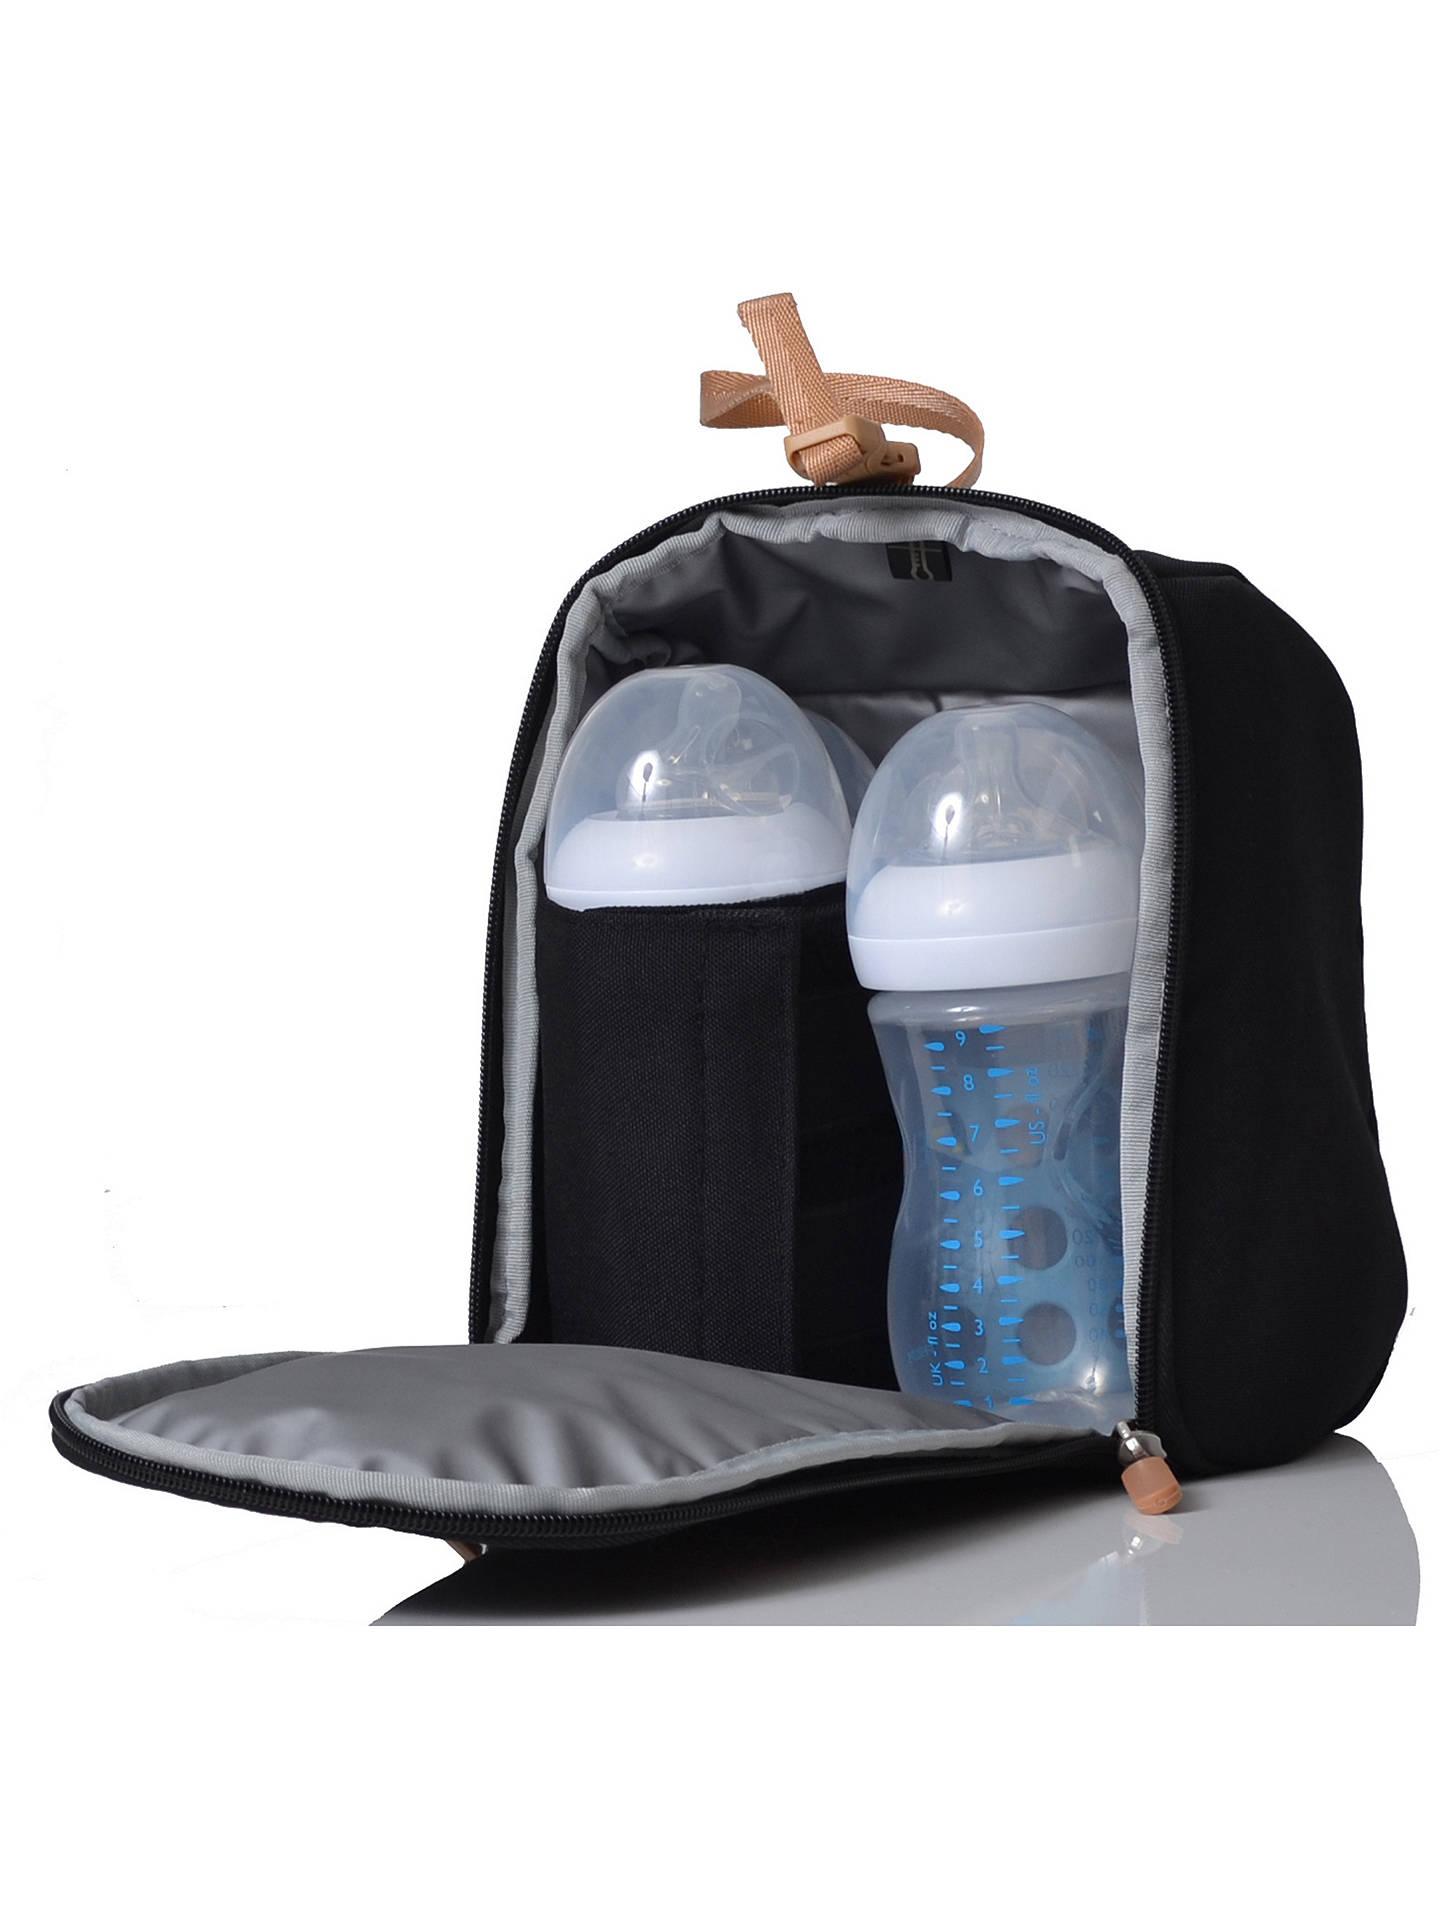 fd9c1b3e1368 ... Buy PacaPod Picos Pack Changing Bag